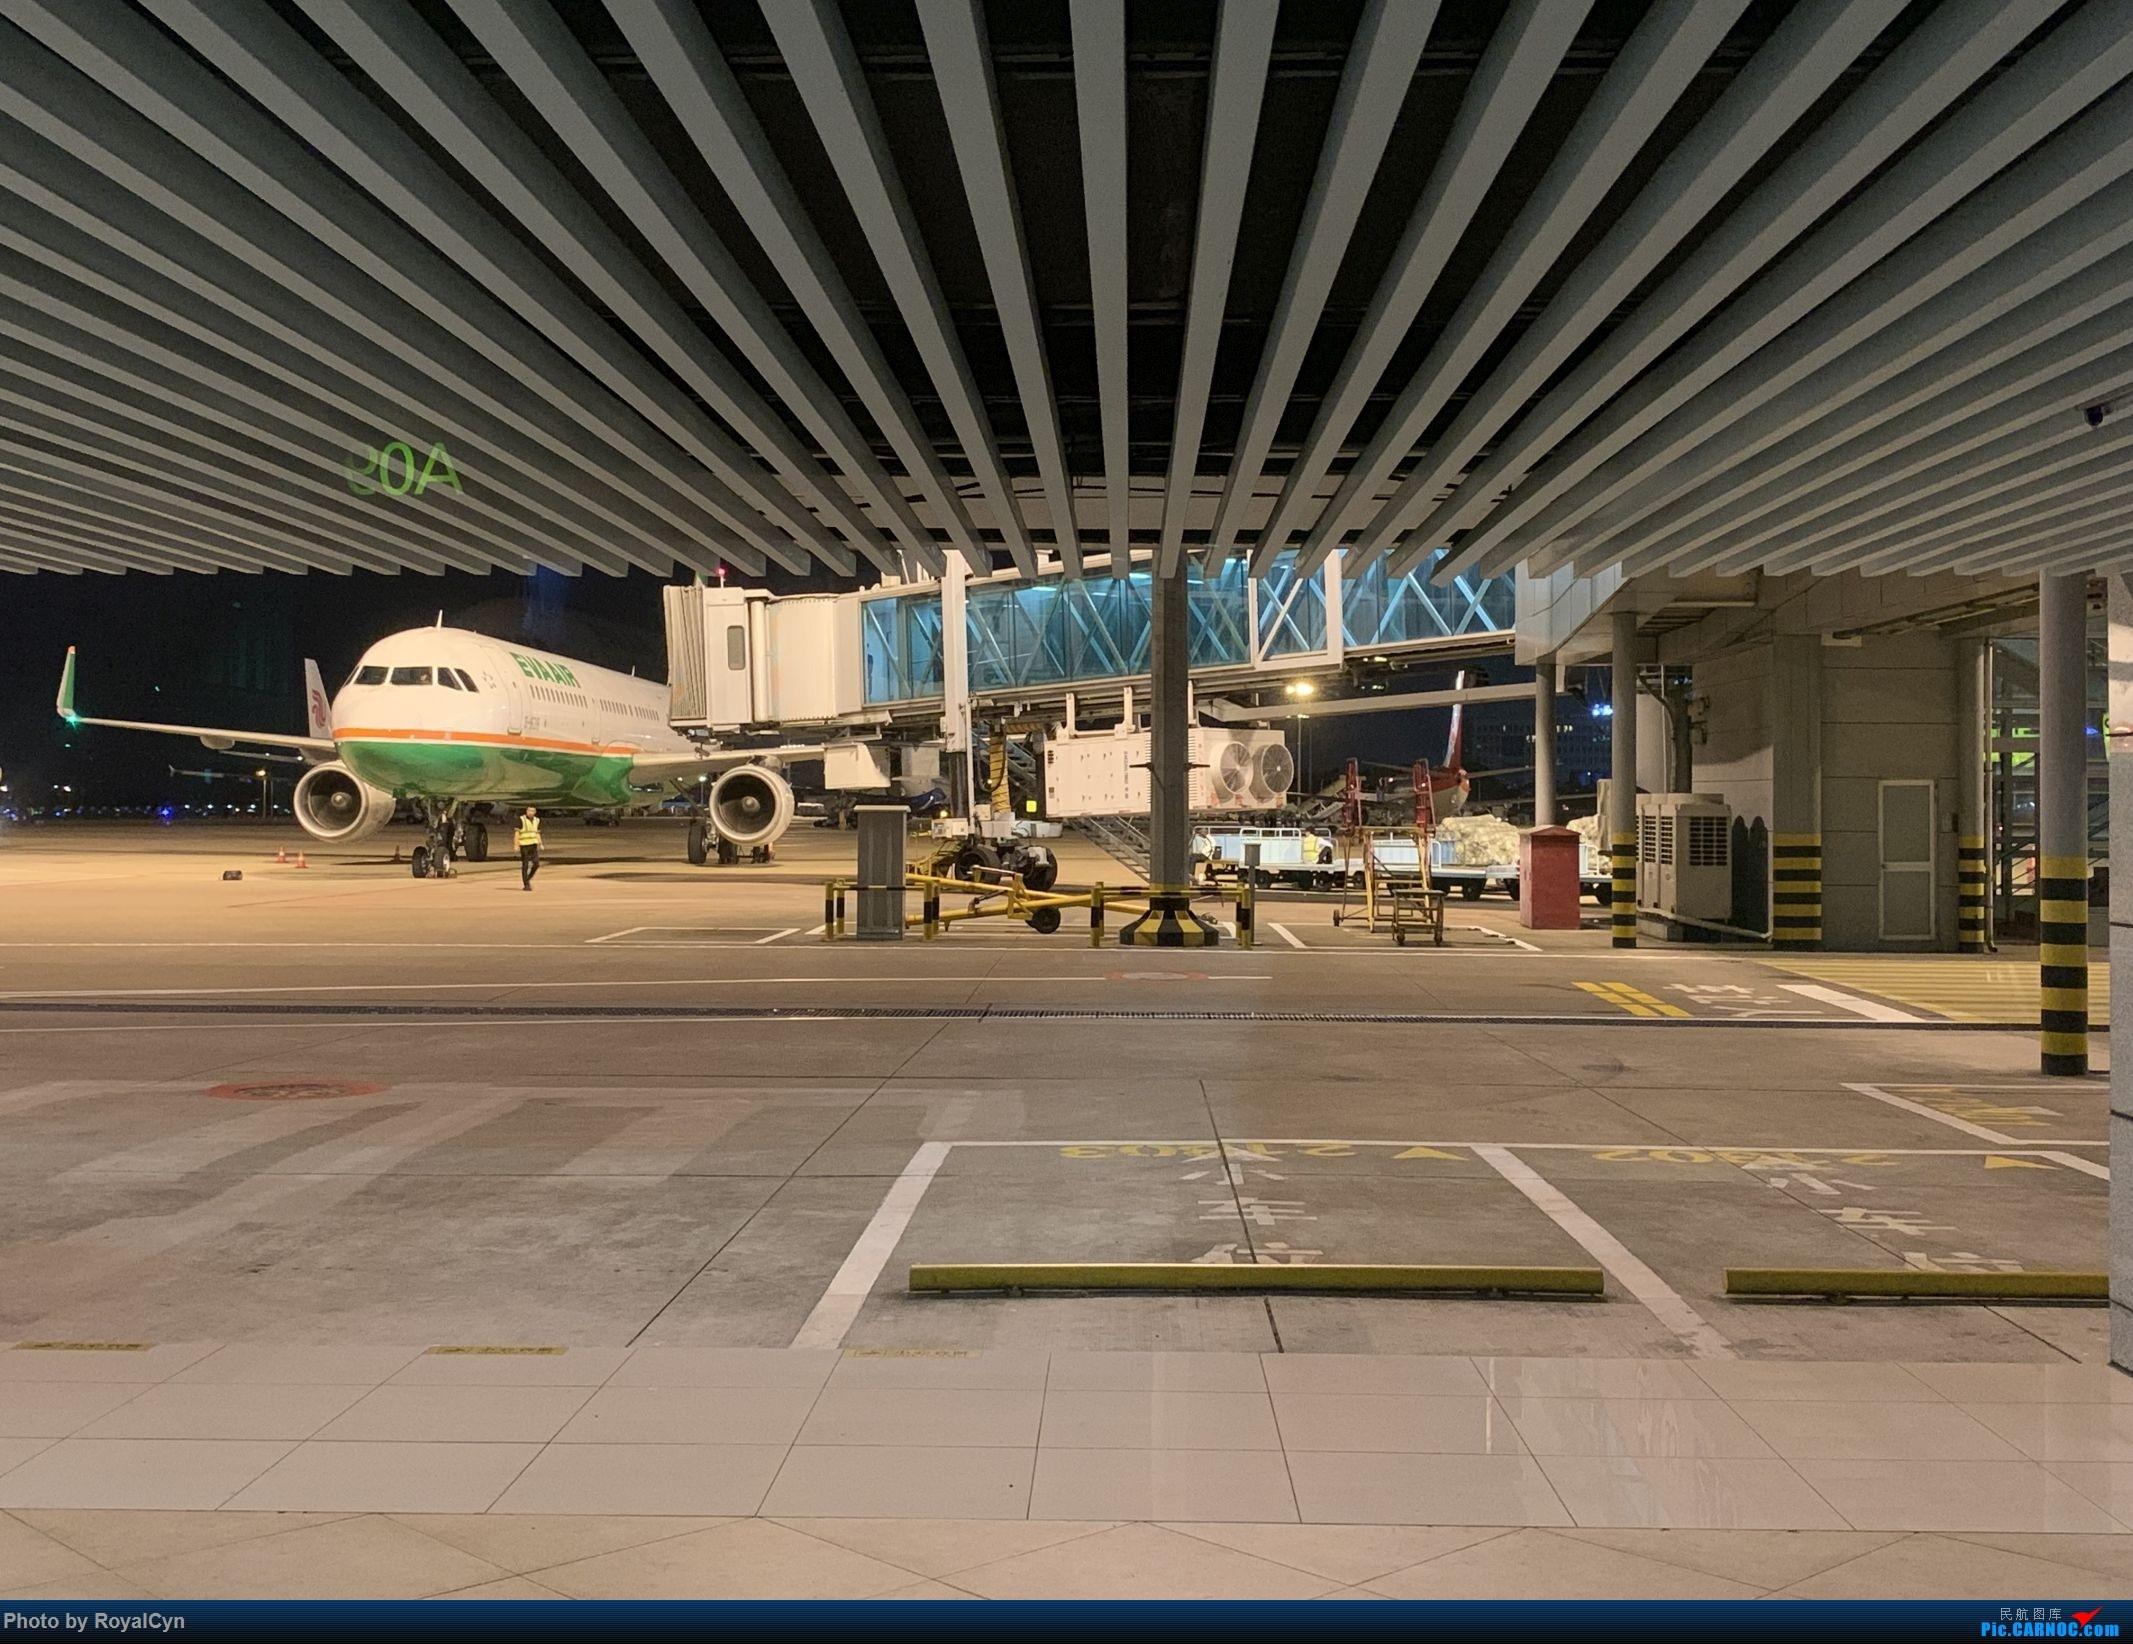 Re:[原创]Royal游记No.3【佛塔国度狂想曲——棉麻国缅甸】三城6日游 AIRBUS A321-200 B-16216 中国杭州萧山国际机场